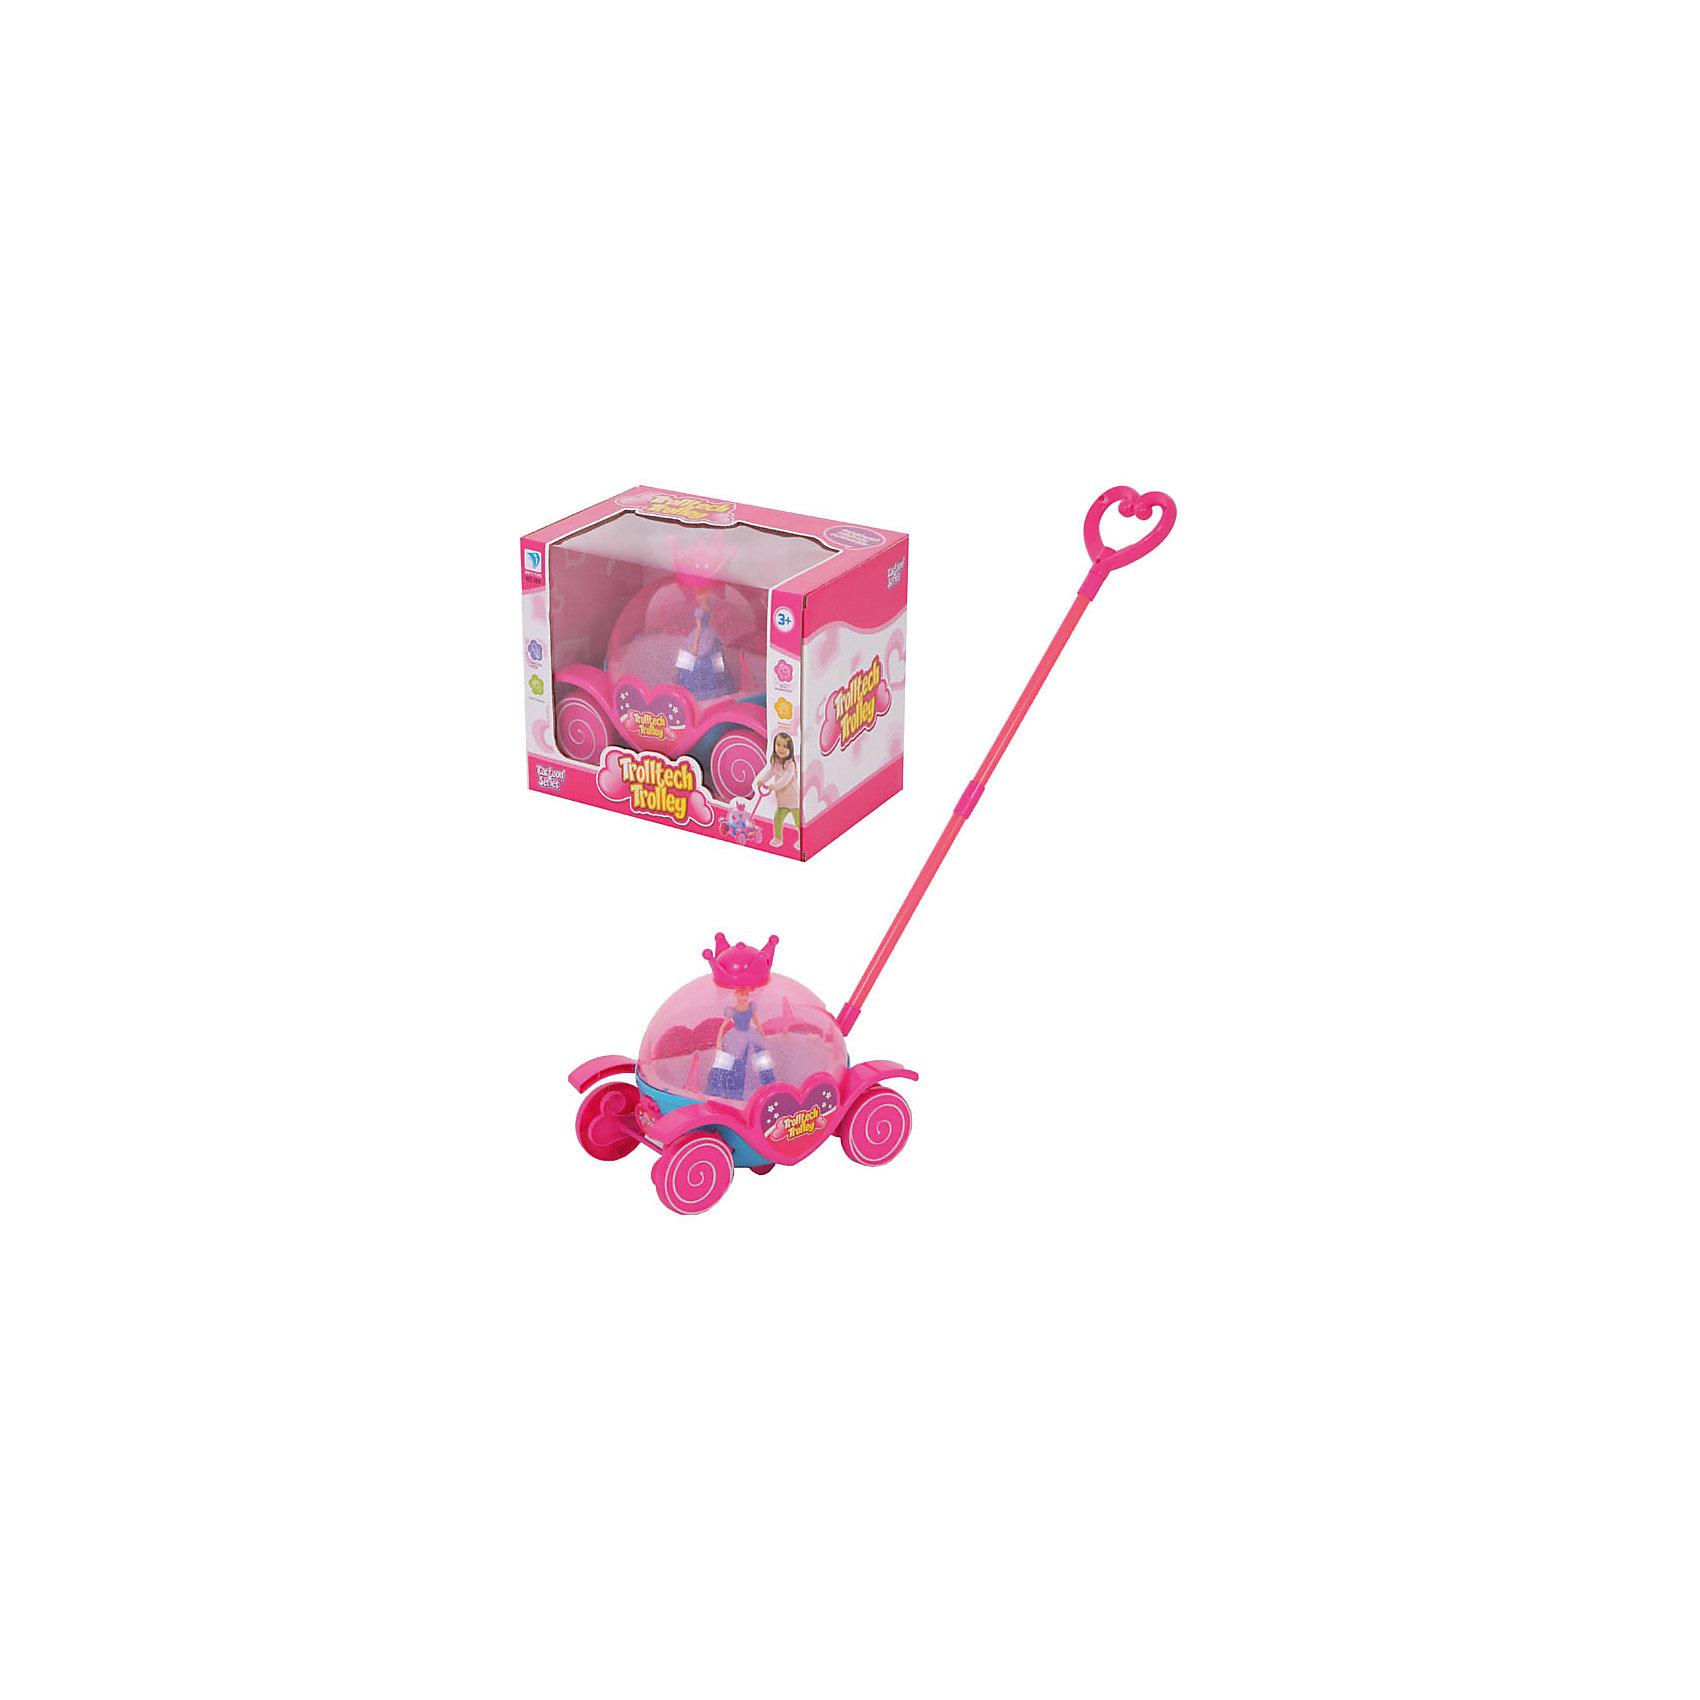 - Каталка Карета Золушки chicco chicco игрушка каталка волшебная карета золушки голубой розовый